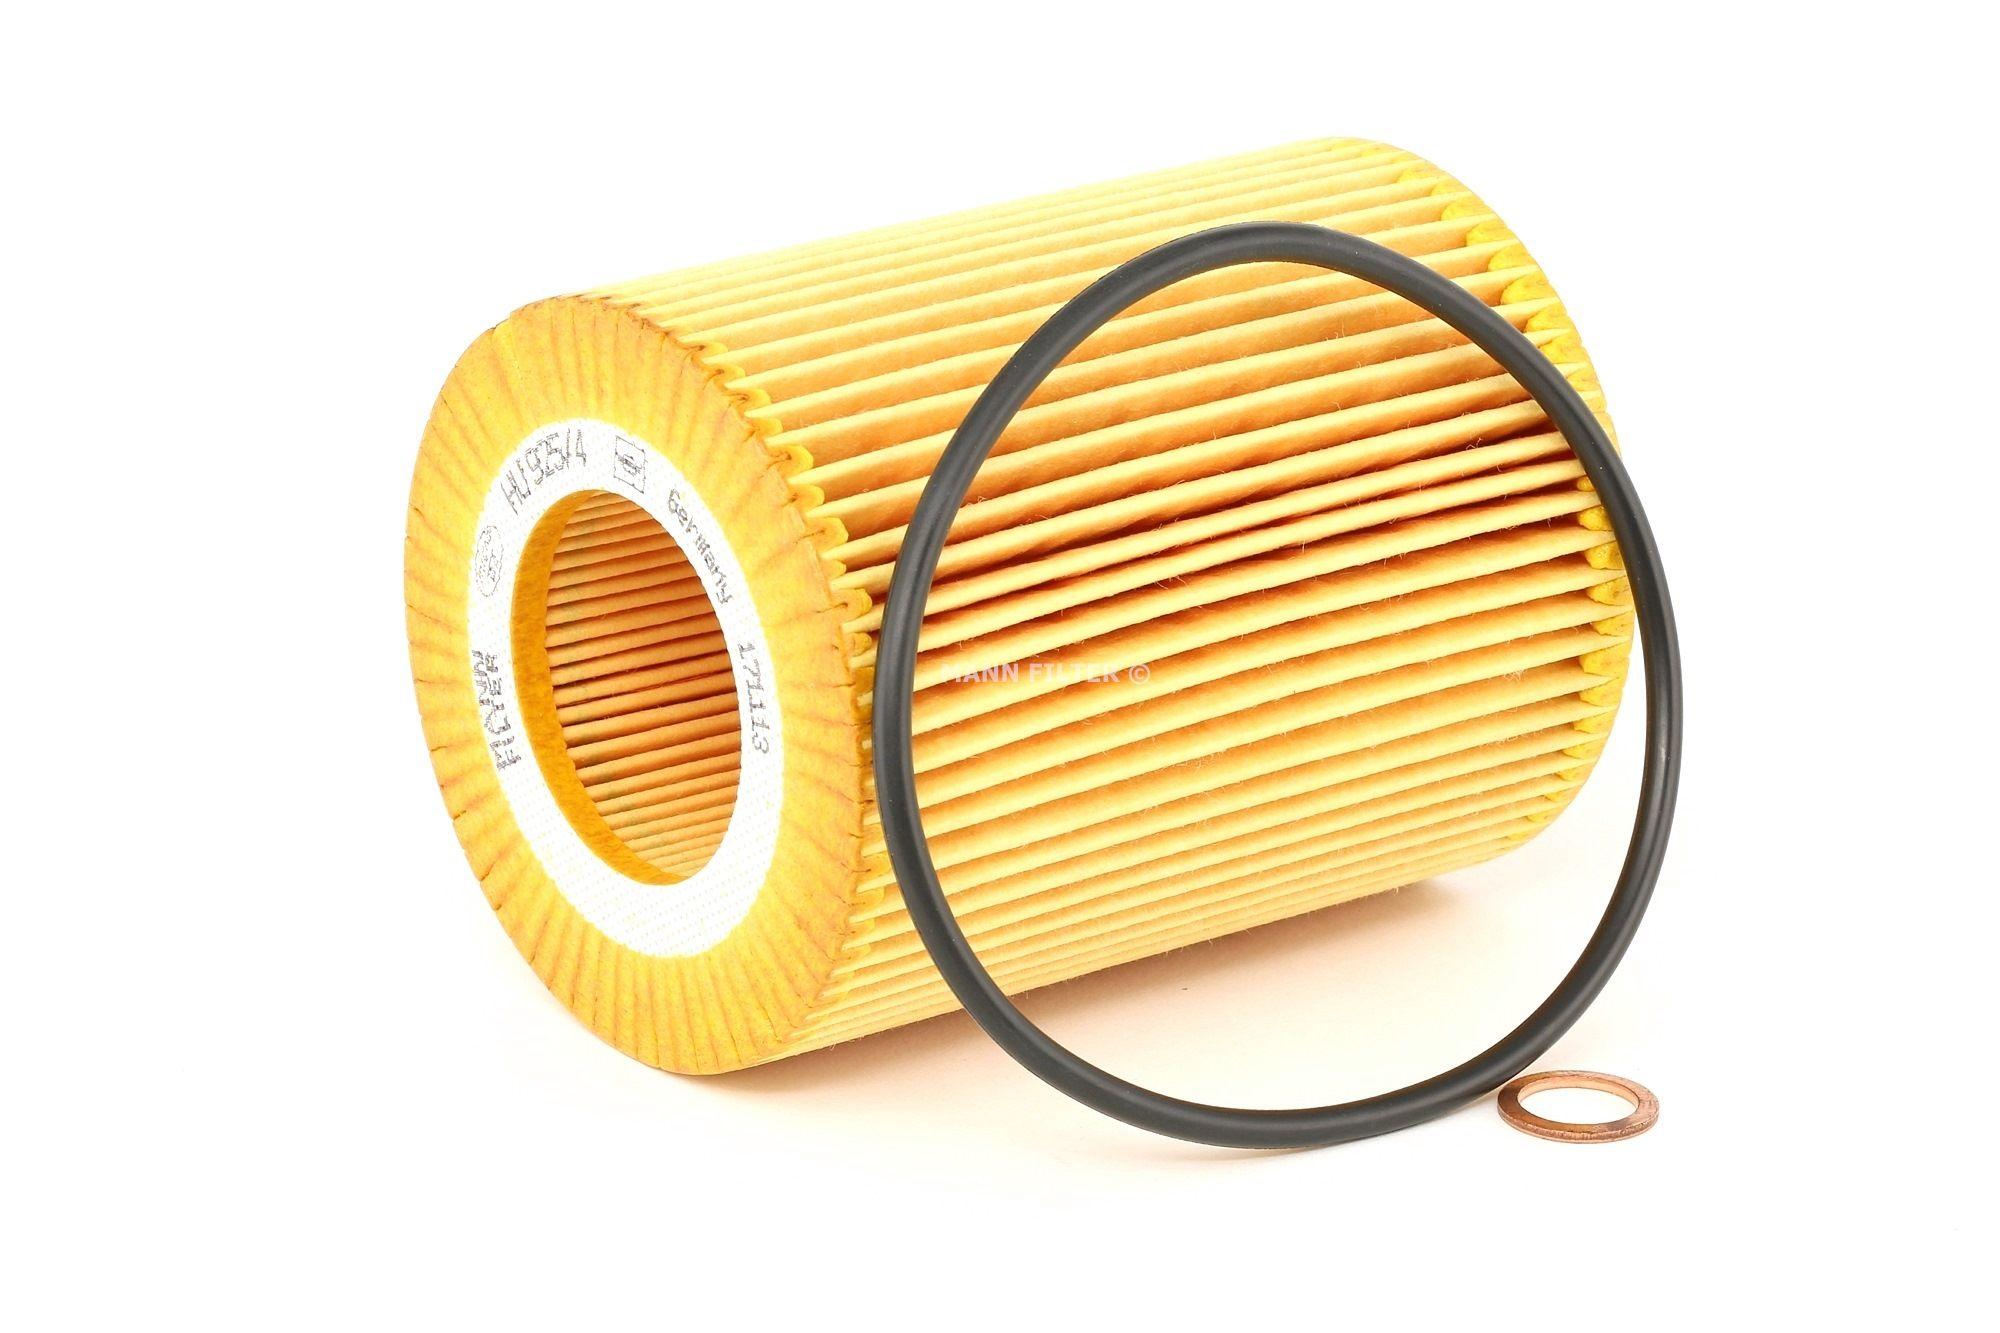 HU 925/4 x MANN-FILTER mit Dichtungen, Filtereinsatz Innendurchmesser: 42mm, Ø: 83mm, Höhe: 104mm Ölfilter HU 925/4 x günstig kaufen